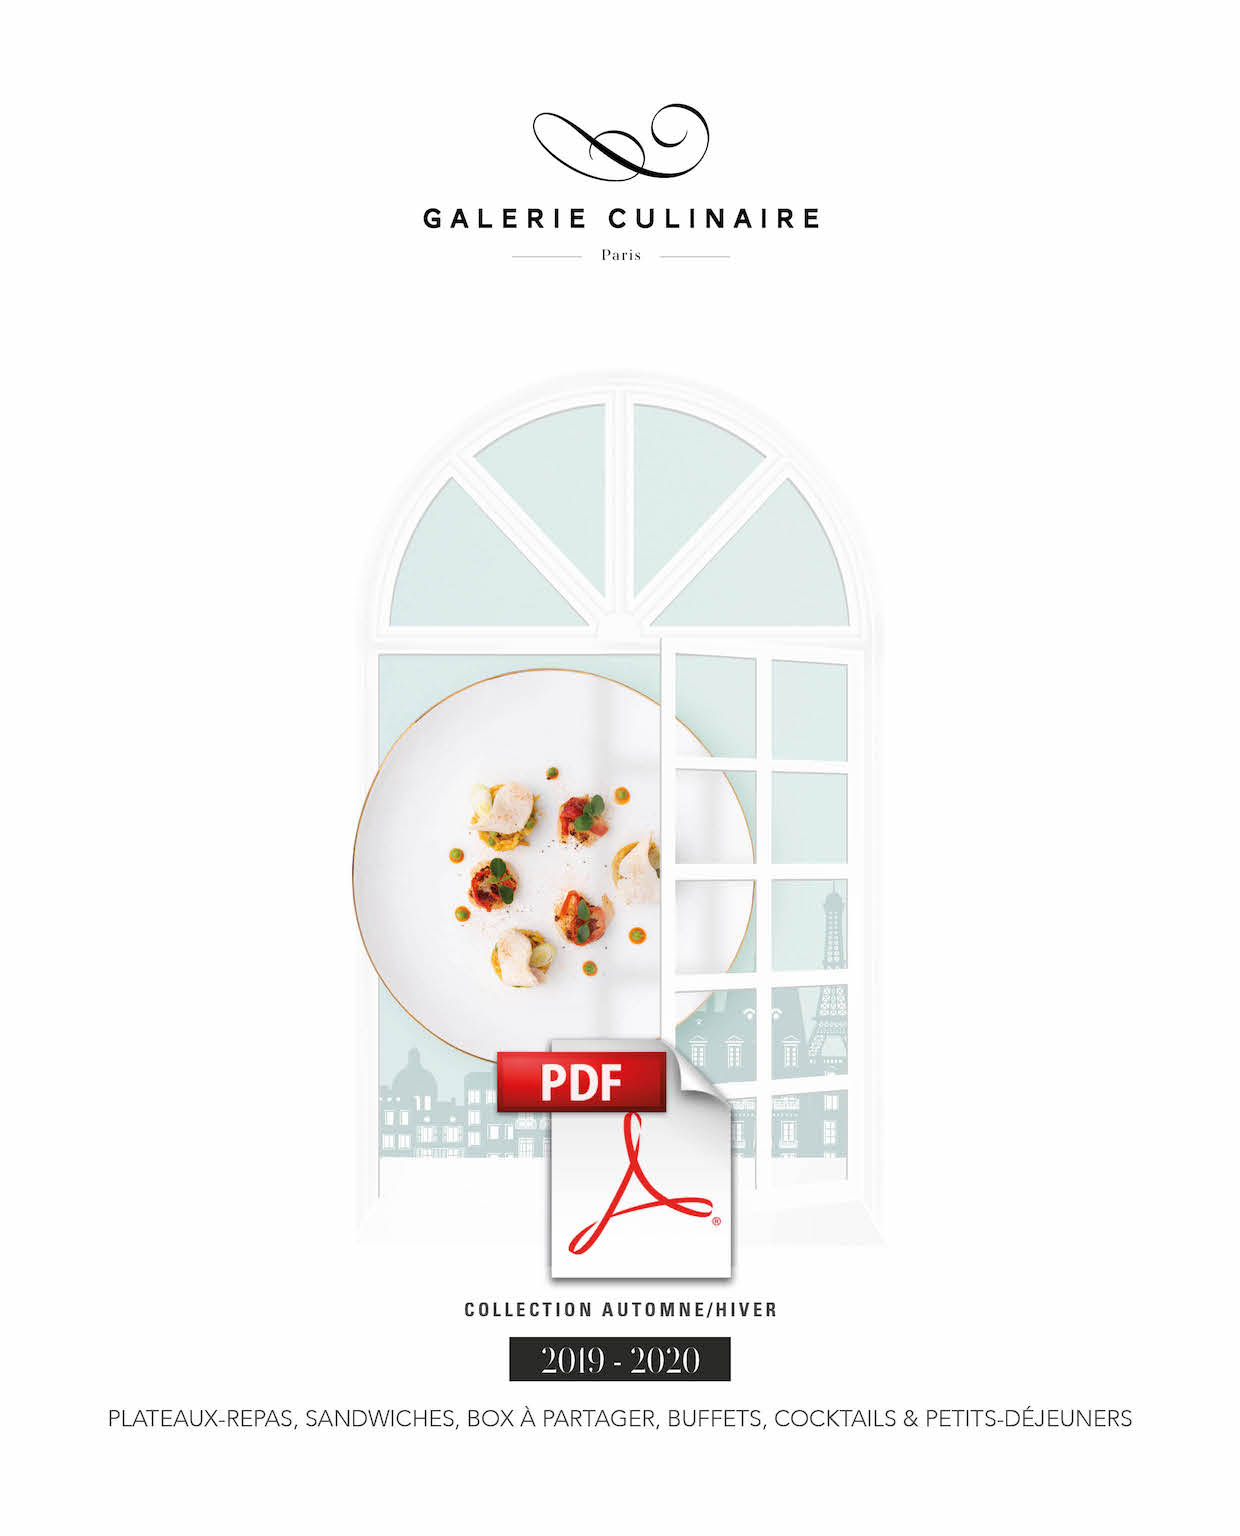 couv-pour-telechargement-PDF.jpg